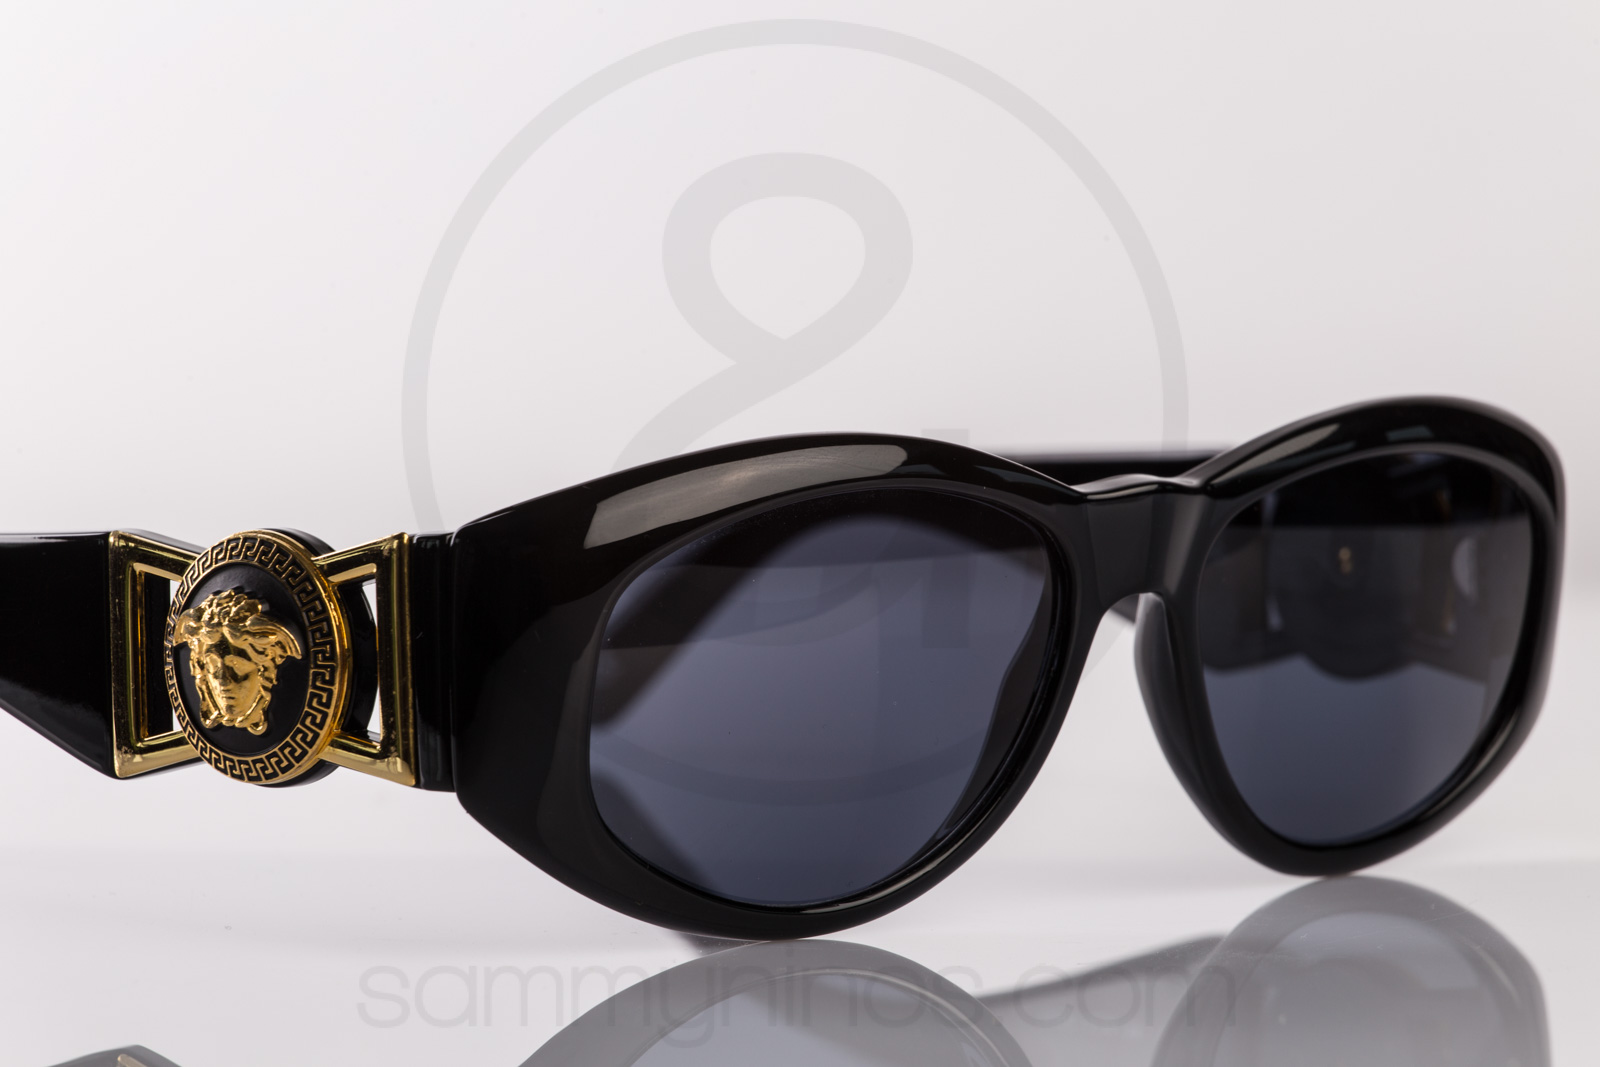 b763b75268a9 Gianni Versace Sunglasses - Bitterroot Public Library